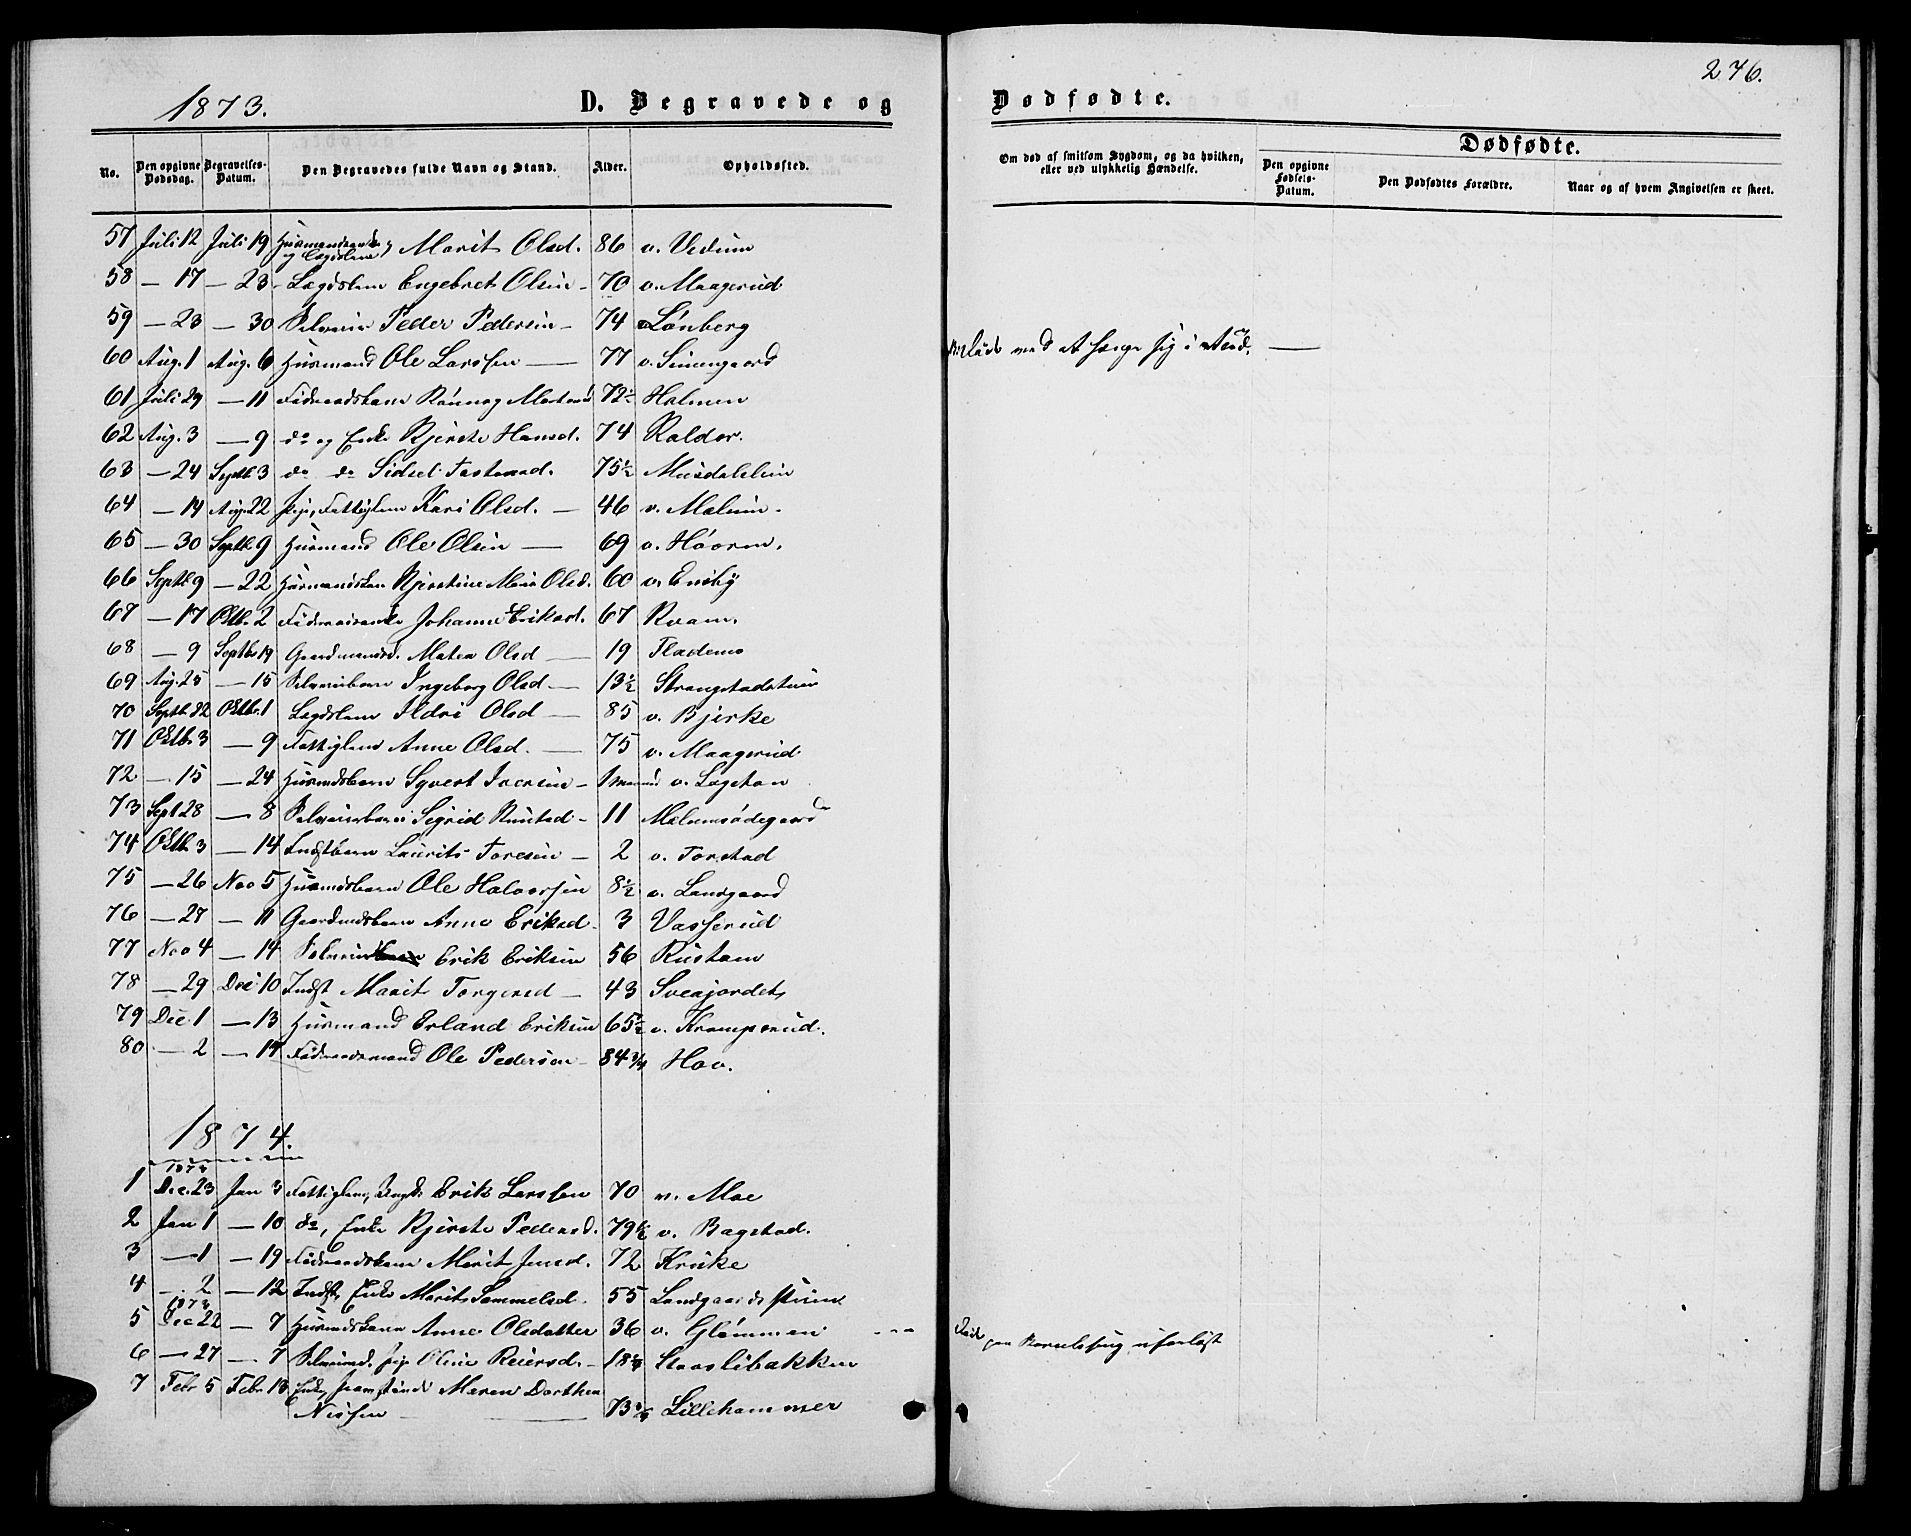 SAH, Øyer prestekontor, Klokkerbok nr. 1, 1863-1877, s. 276